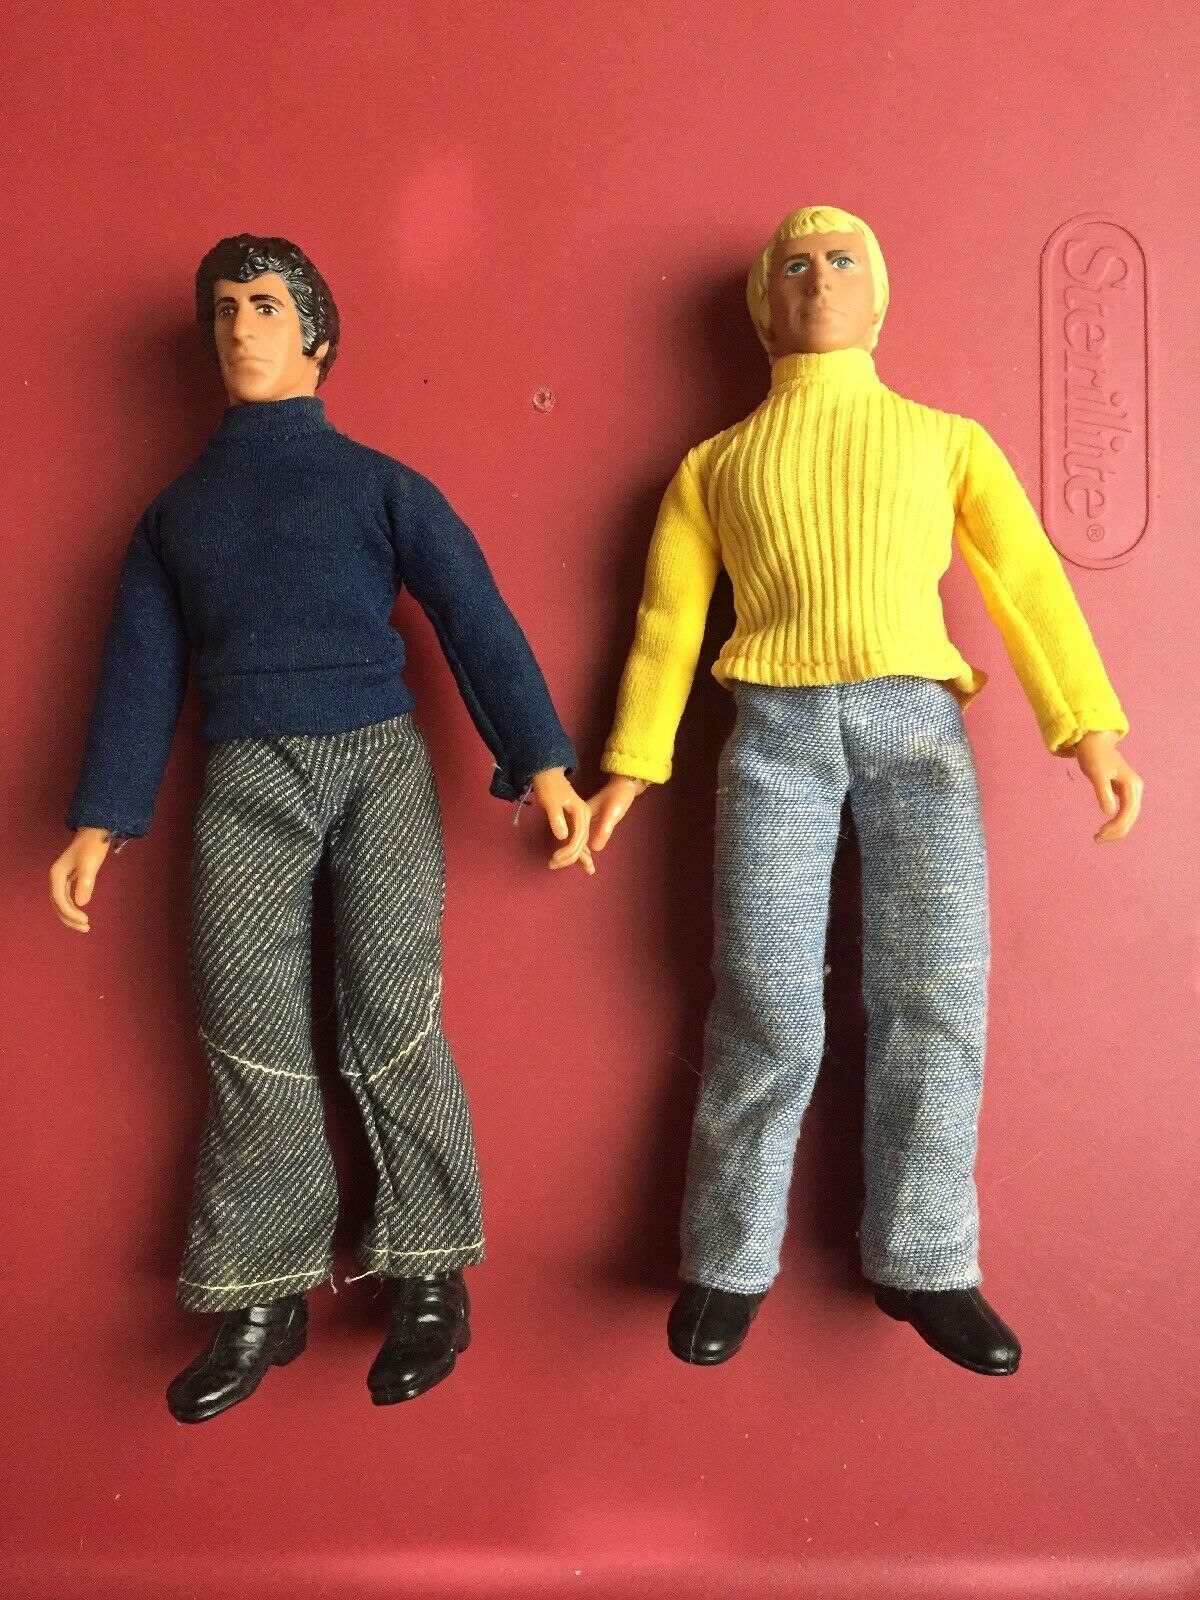 Vintage 1970's Mego estrellacielo e HUTCH 8 azione cifras Jointed bambolas